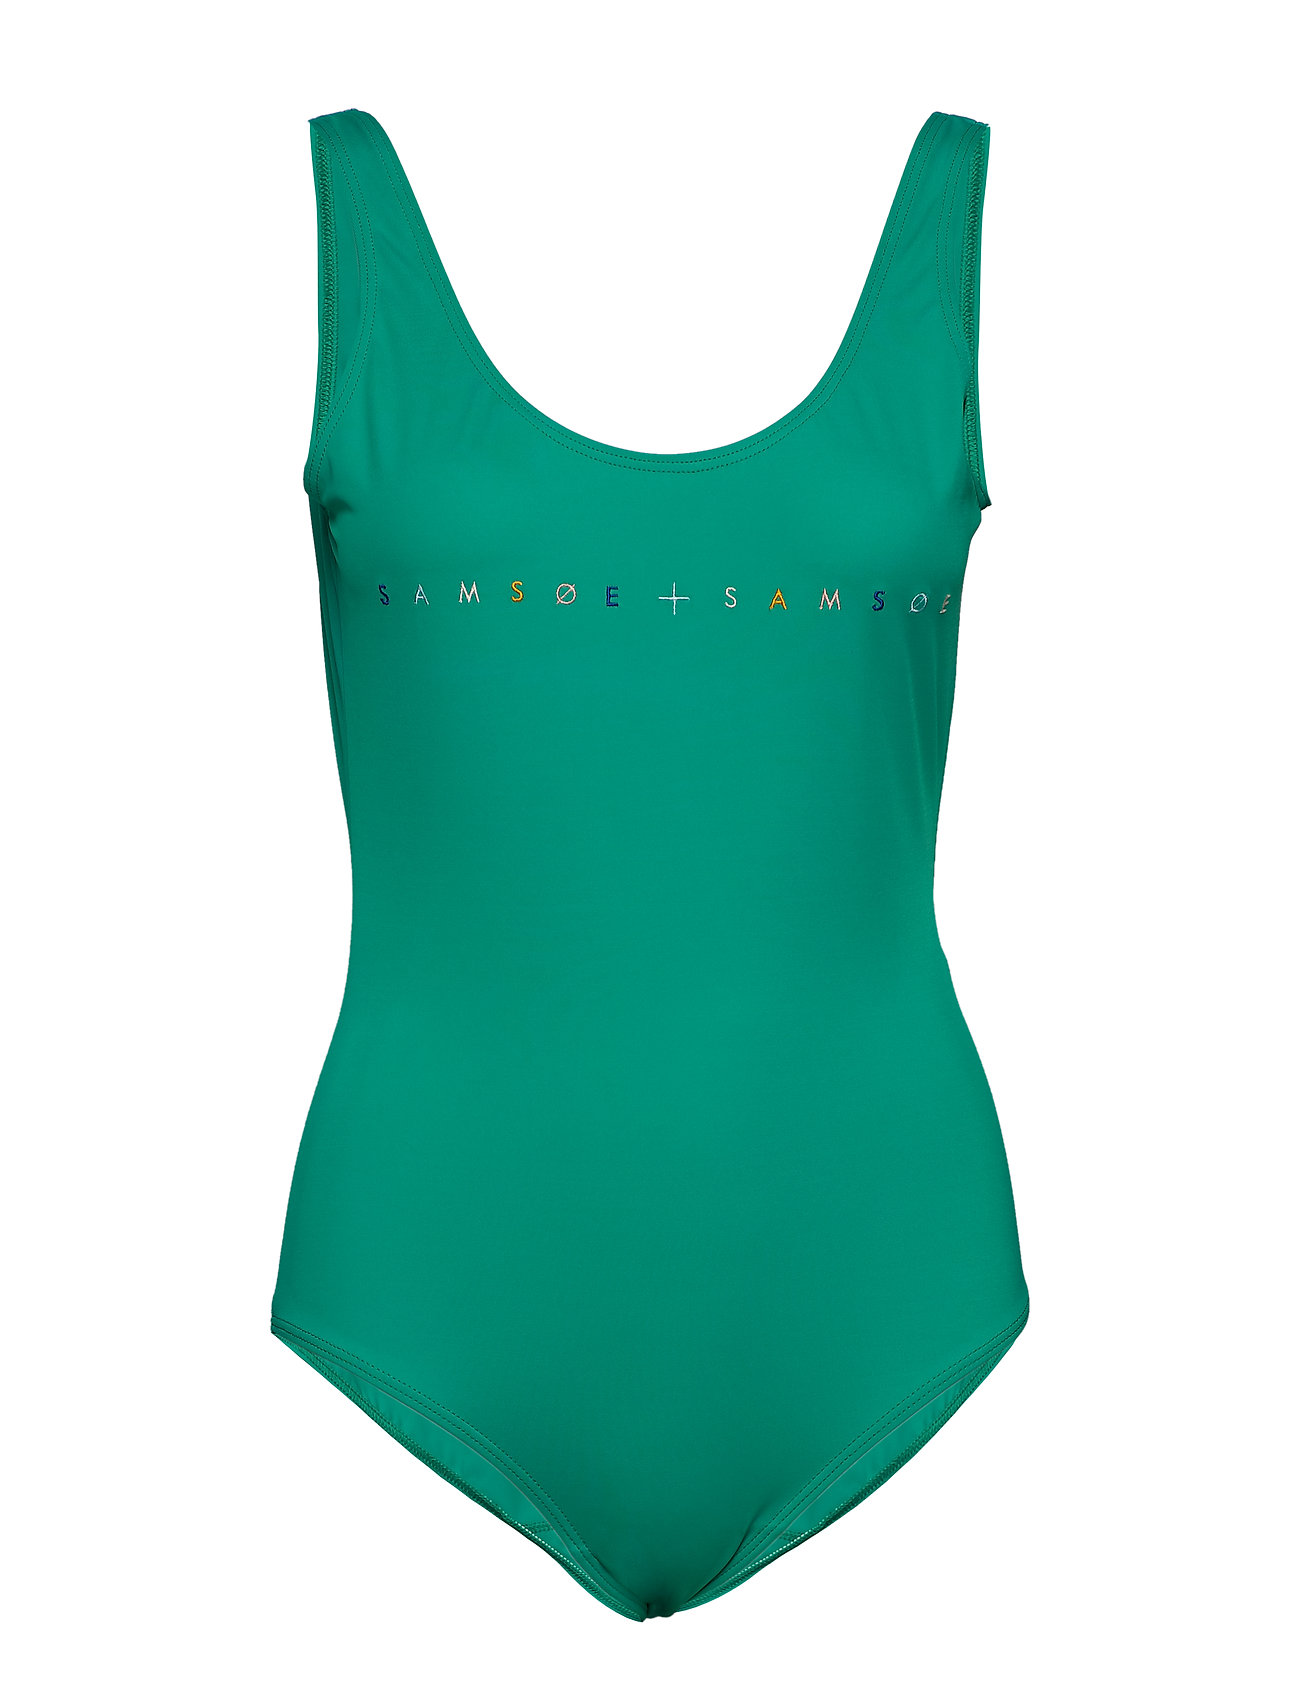 GreenSamsøeamp; Swimsuit Swimsuit GreenSamsøeamp; 10725sea Bari Swimsuit 10725sea Bari Bari pVzSUM